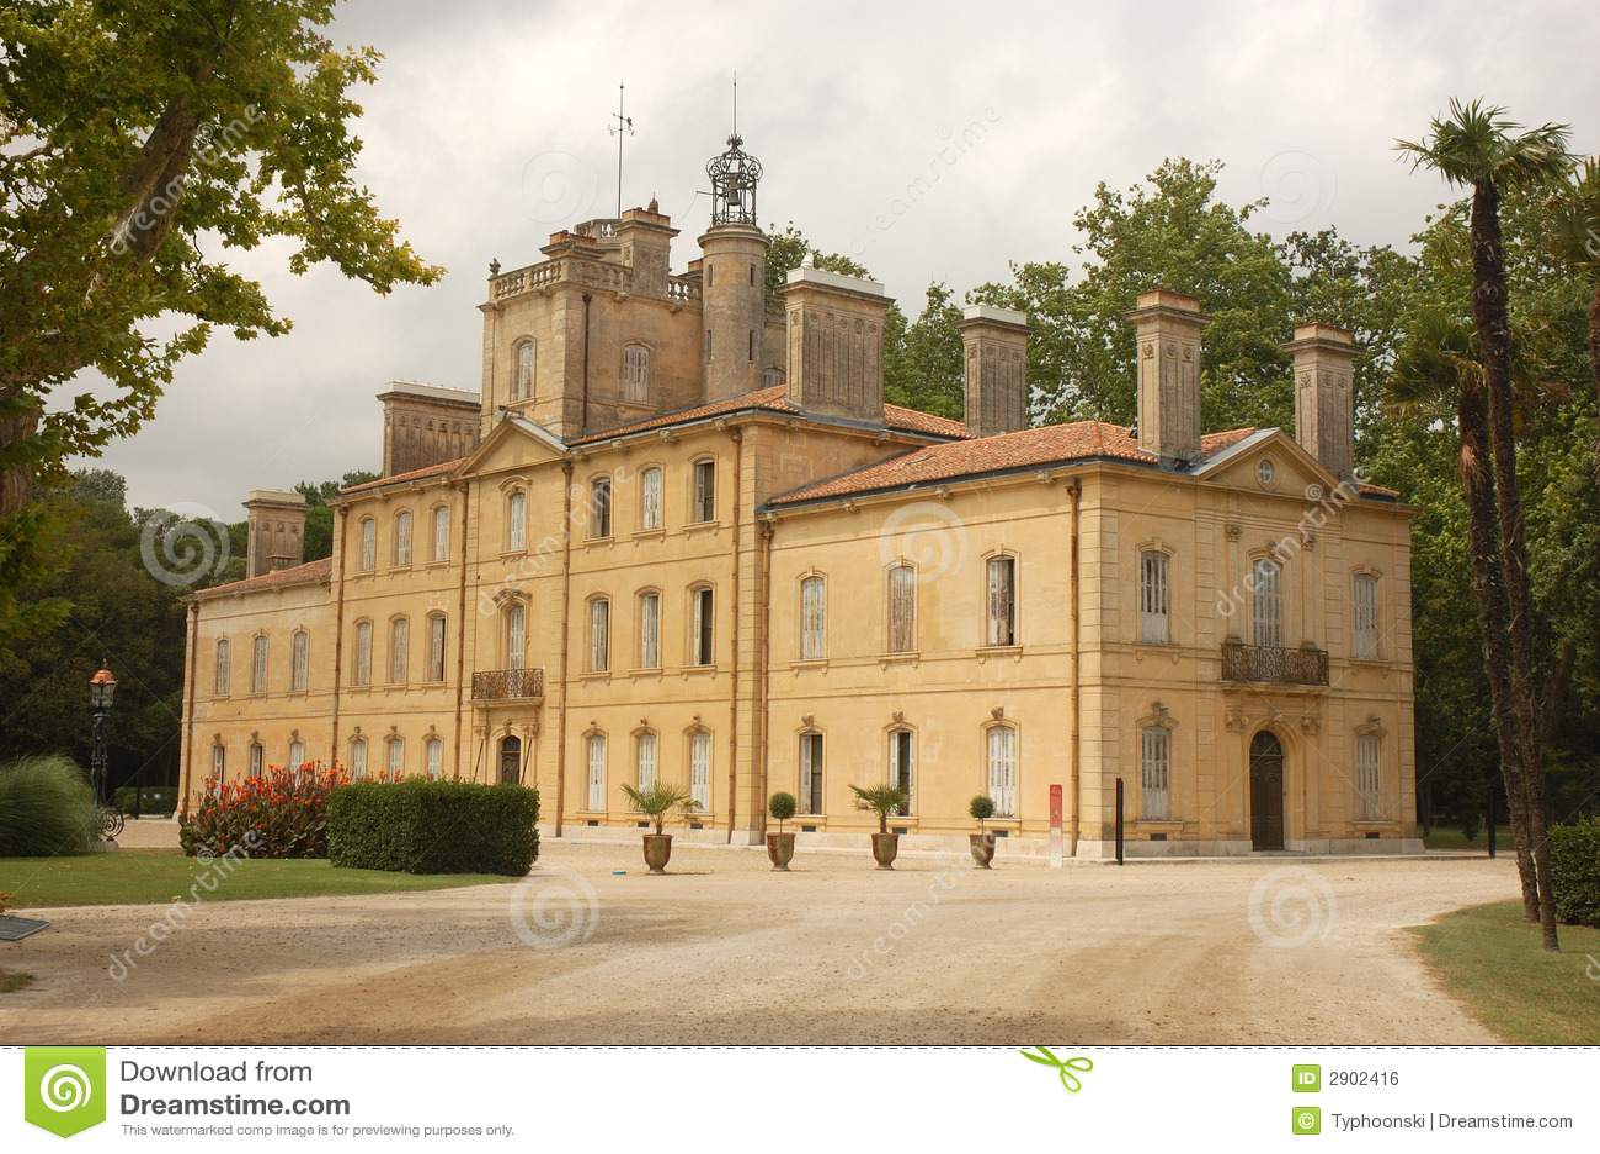 Chateau d 39 avignon royalty free stock image image 2902416 for Ch d avignon